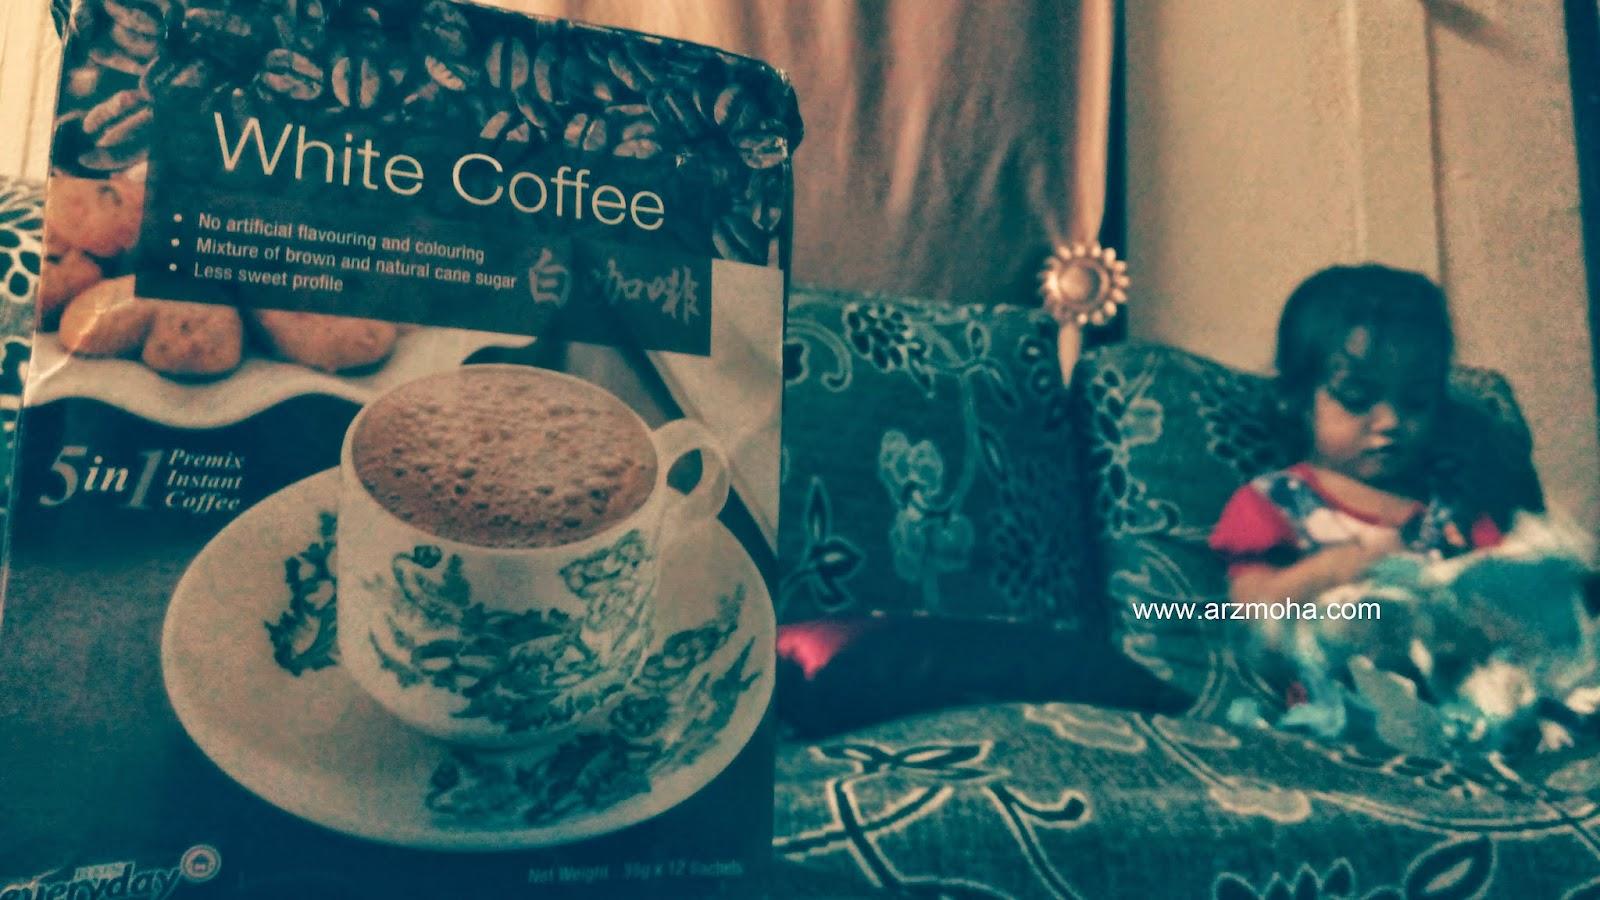 Elken, Pesona dan Mustika, White Coffee 5 in 1, arzmoha, istimewa dari blogger,